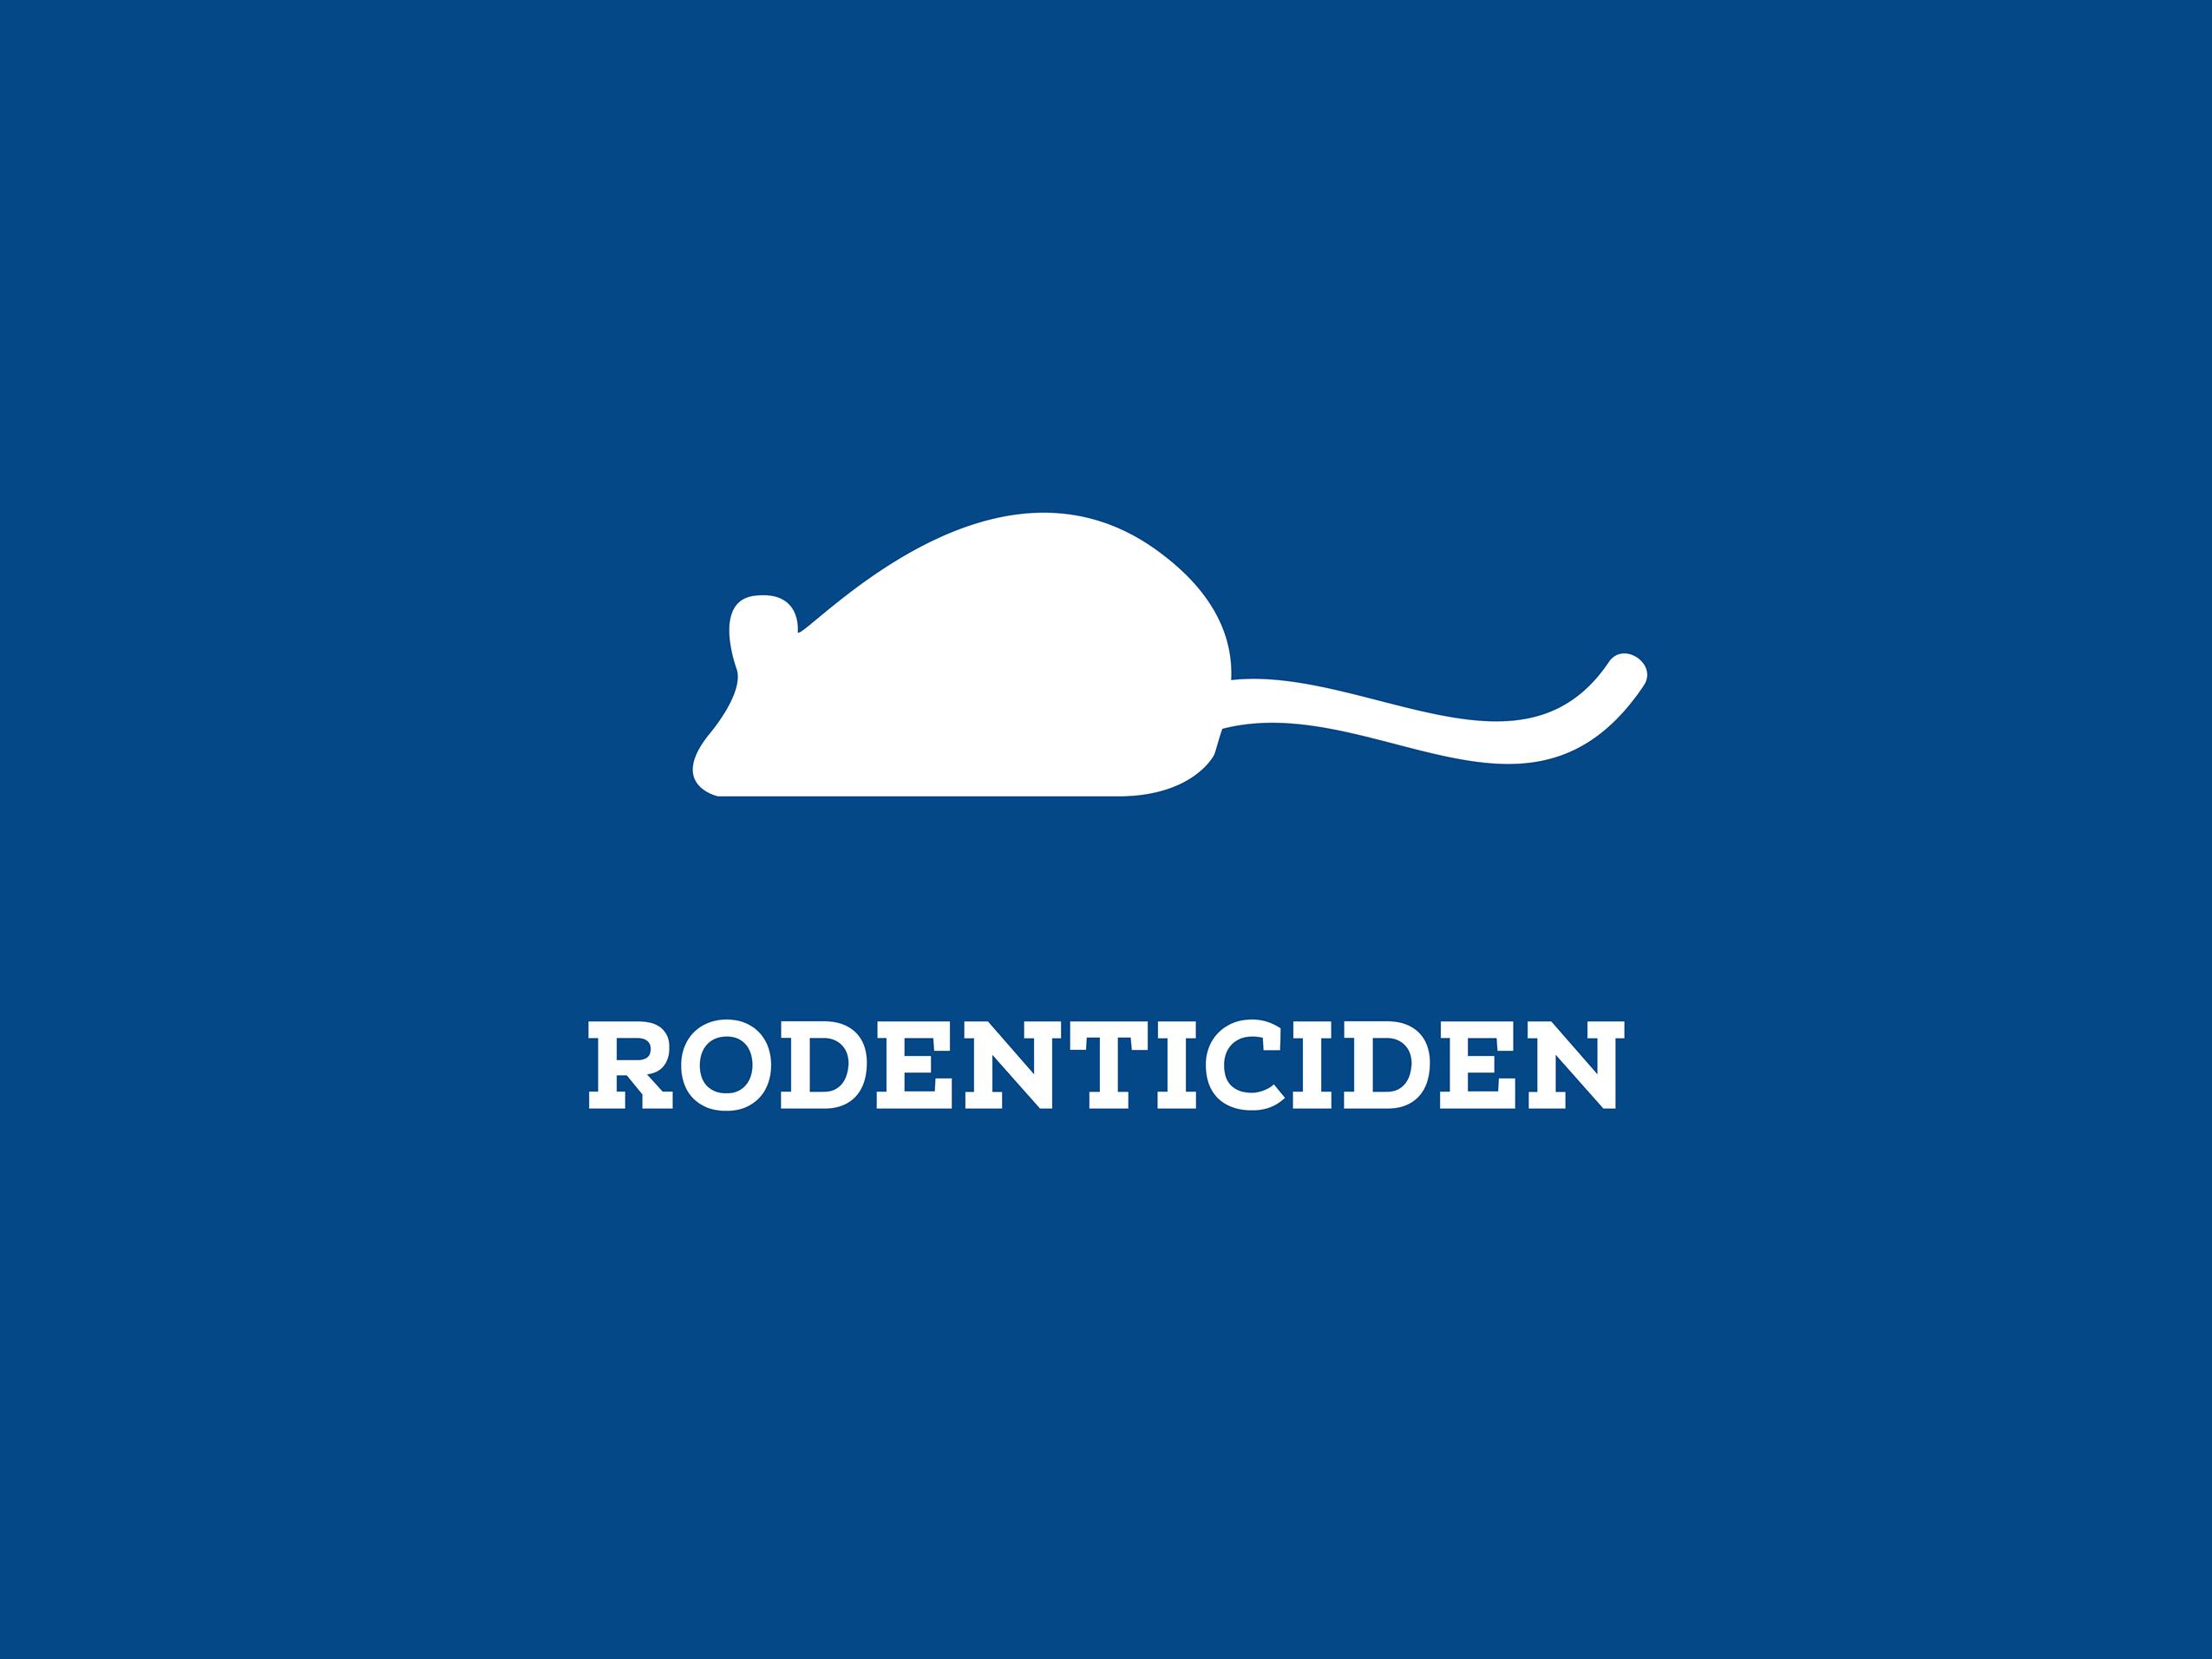 Rodenticiden